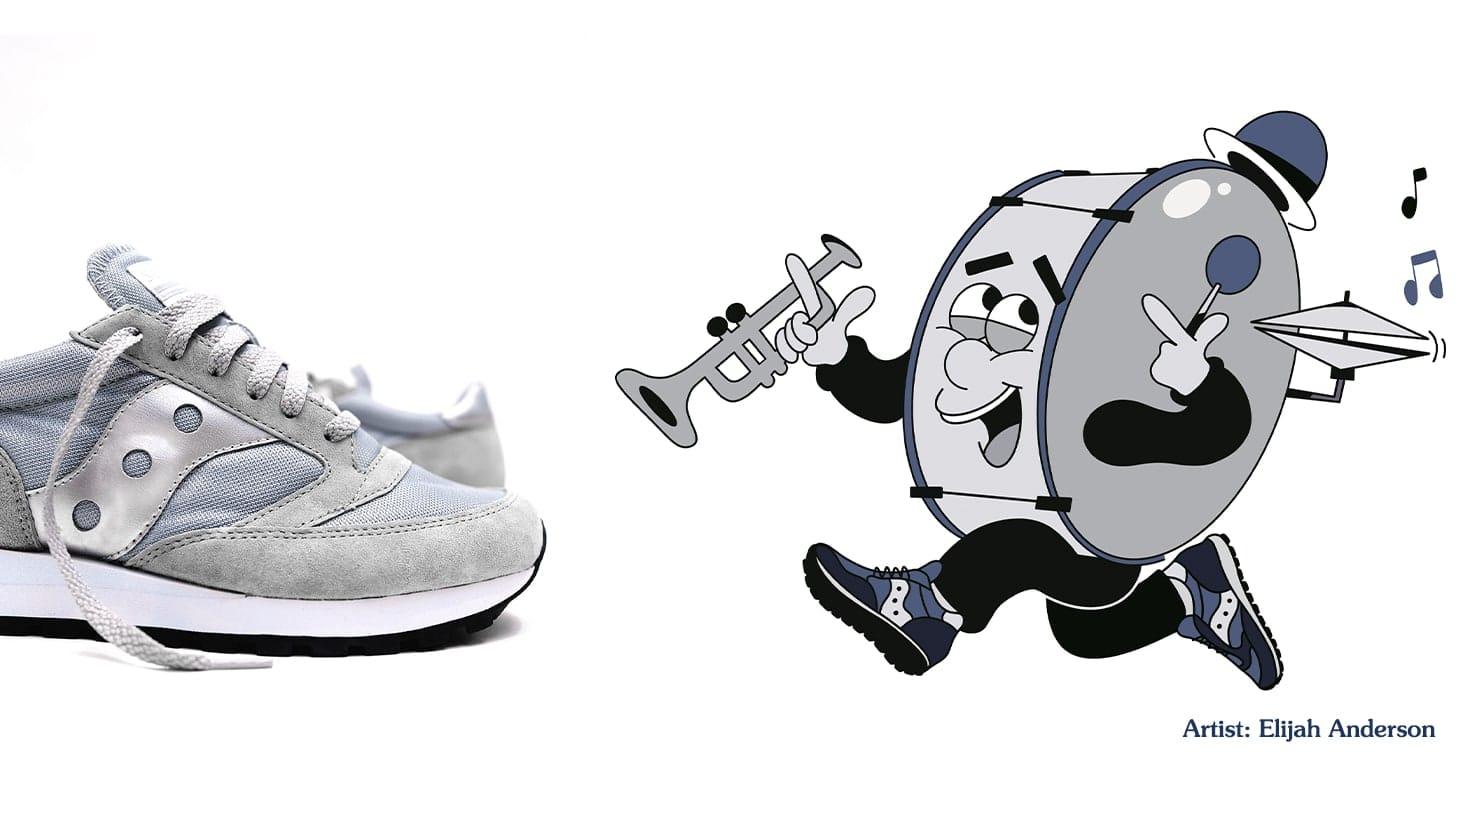 Jazz band animation drawing and Suacony Jazz shoe.